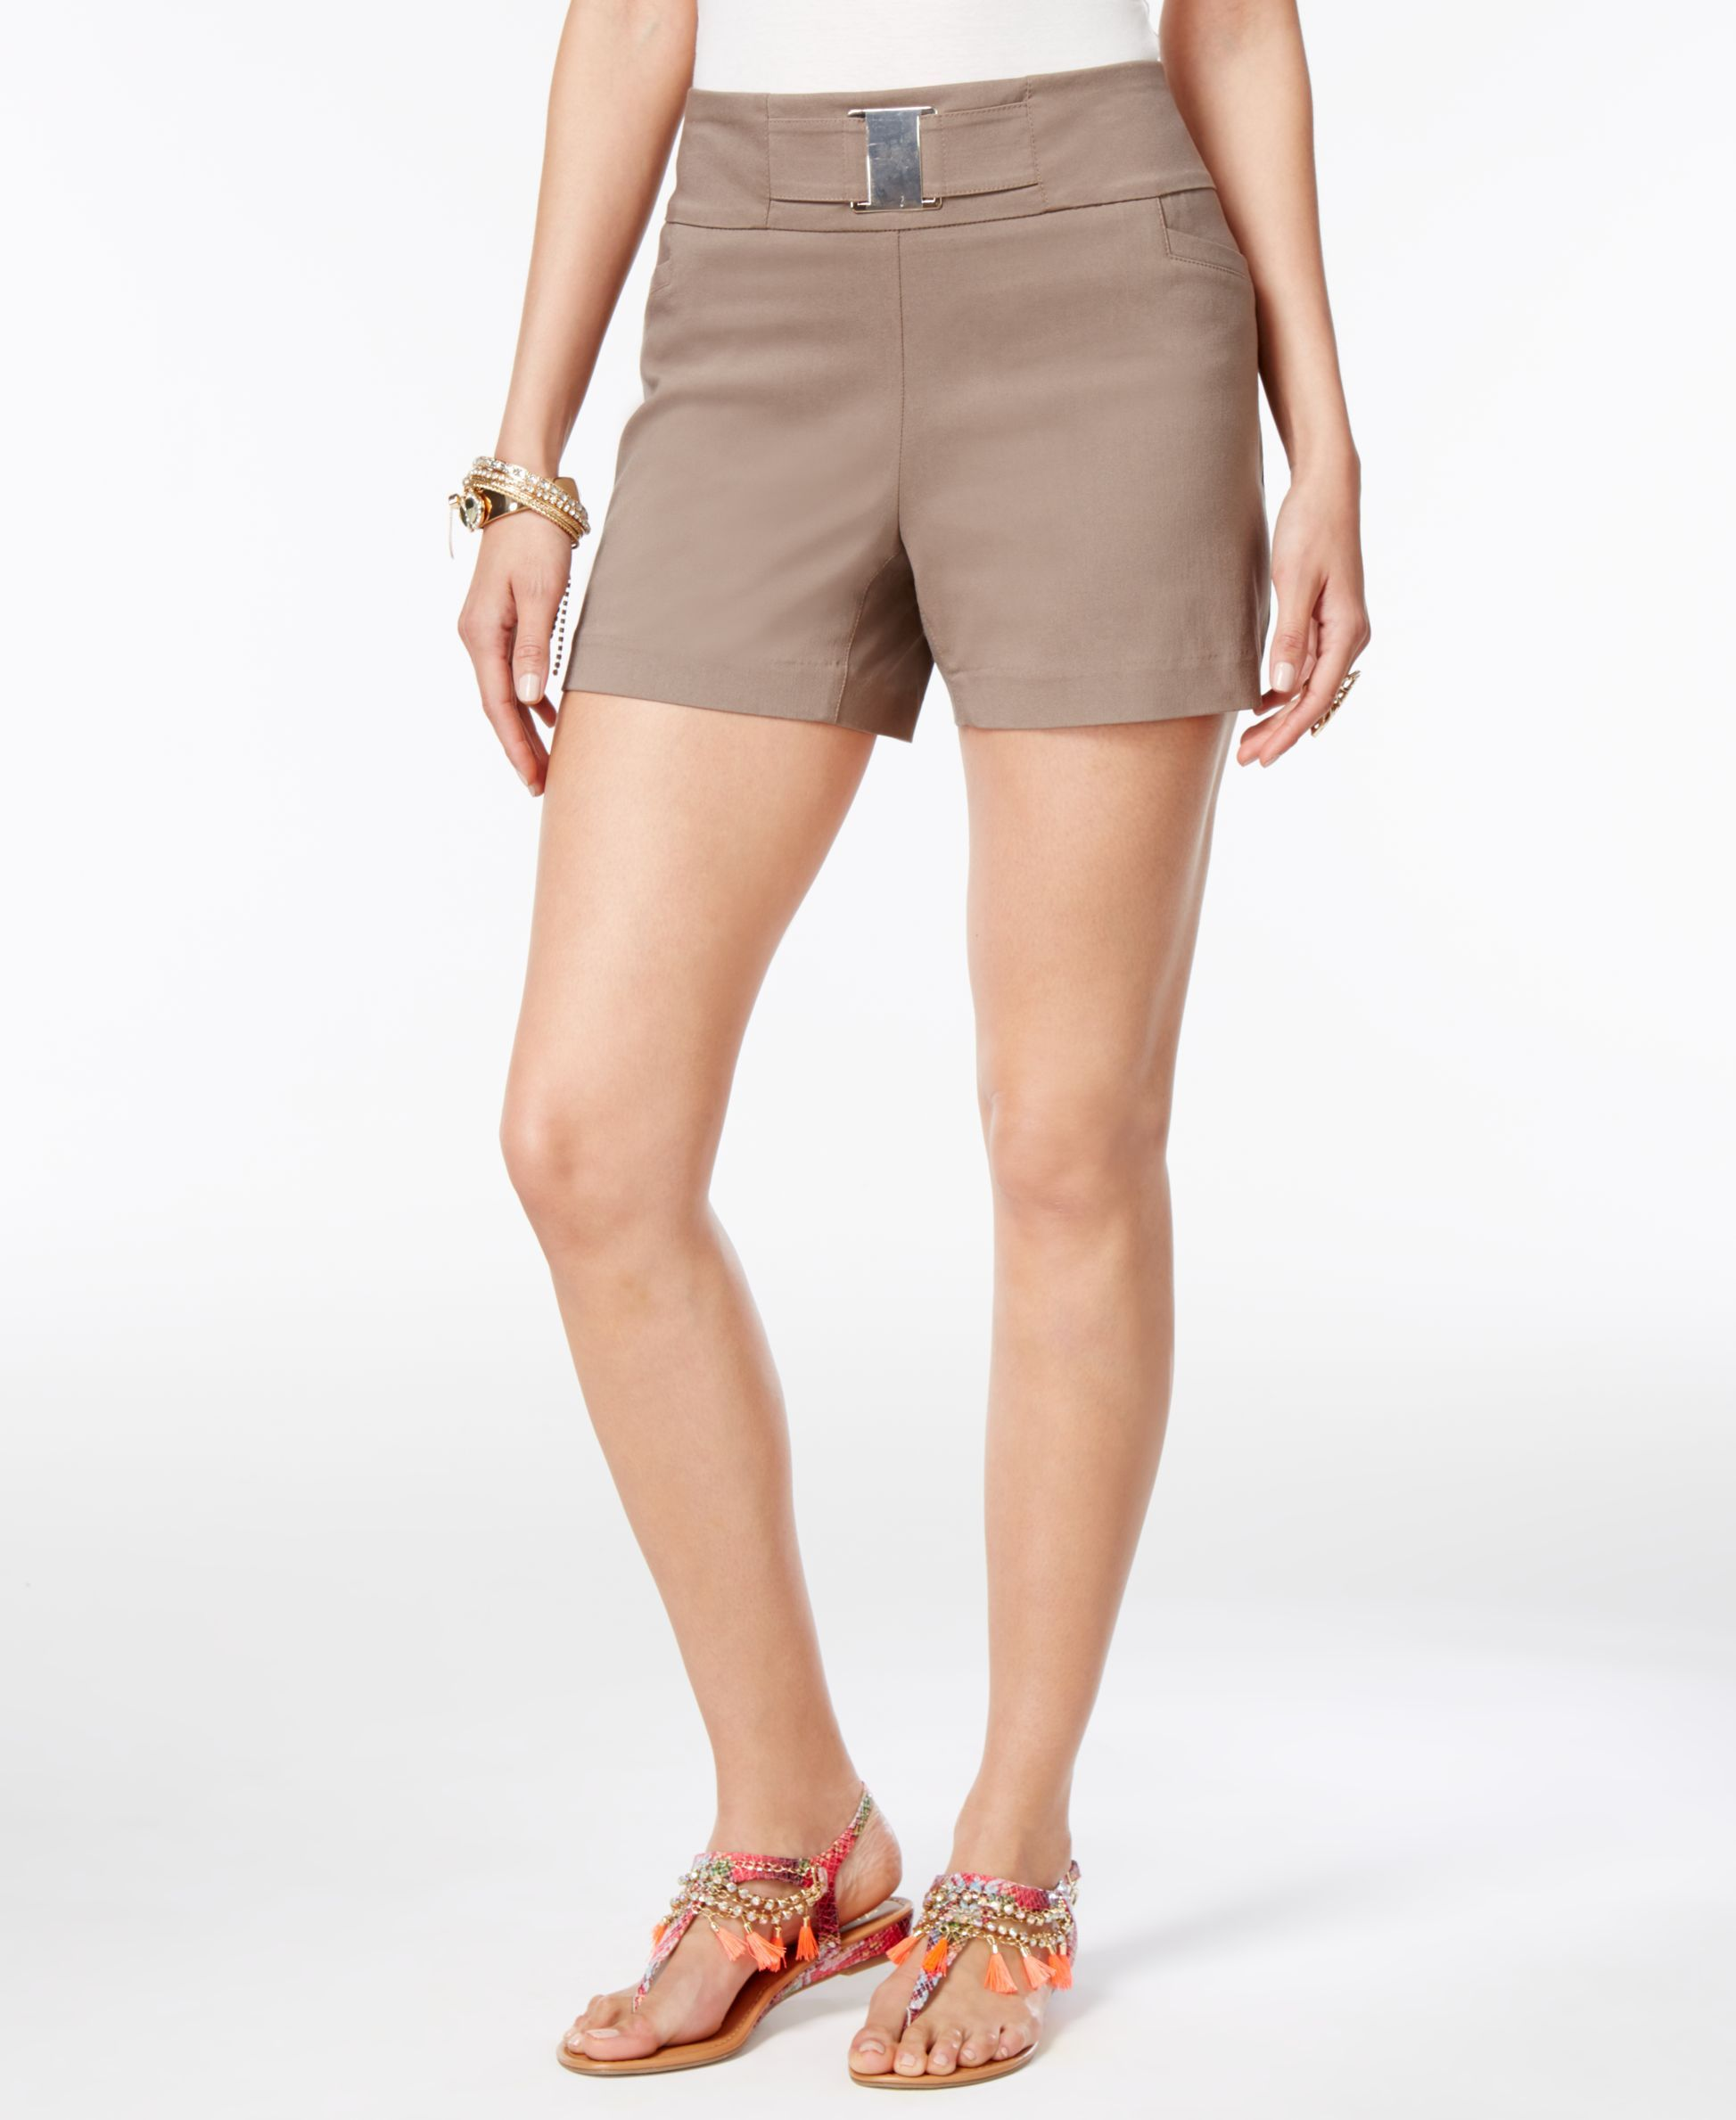 Thalia Sodi Buckle-Detail Shorts, Only at Macy's